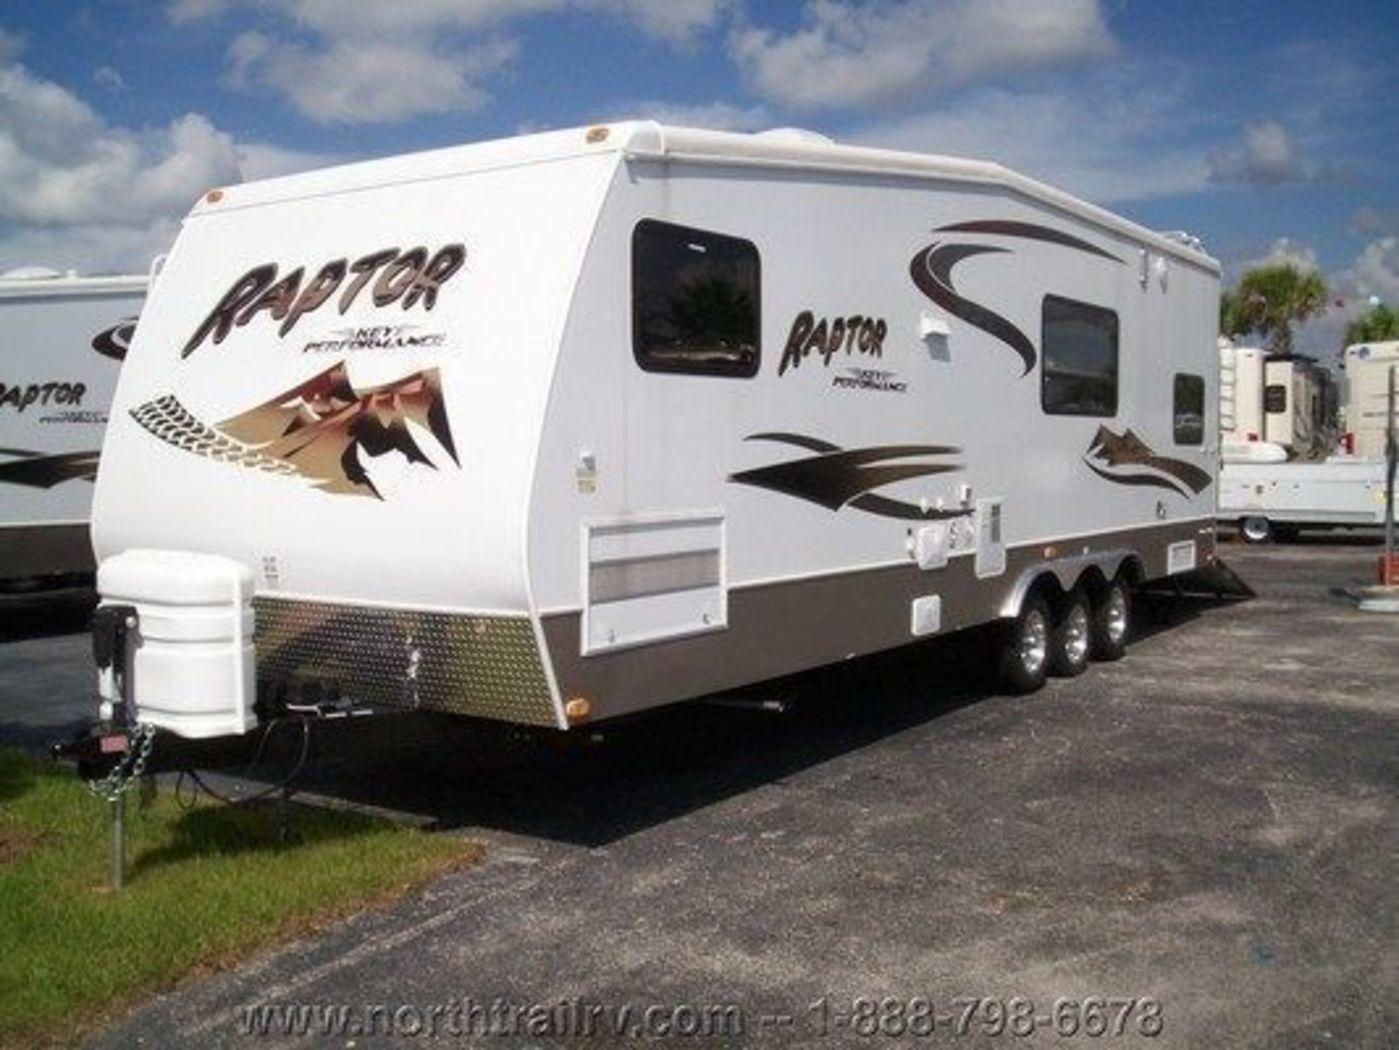 RV Rentals in Loxahatchee, FL - - 2007 Toy-Hauler Keystone ...